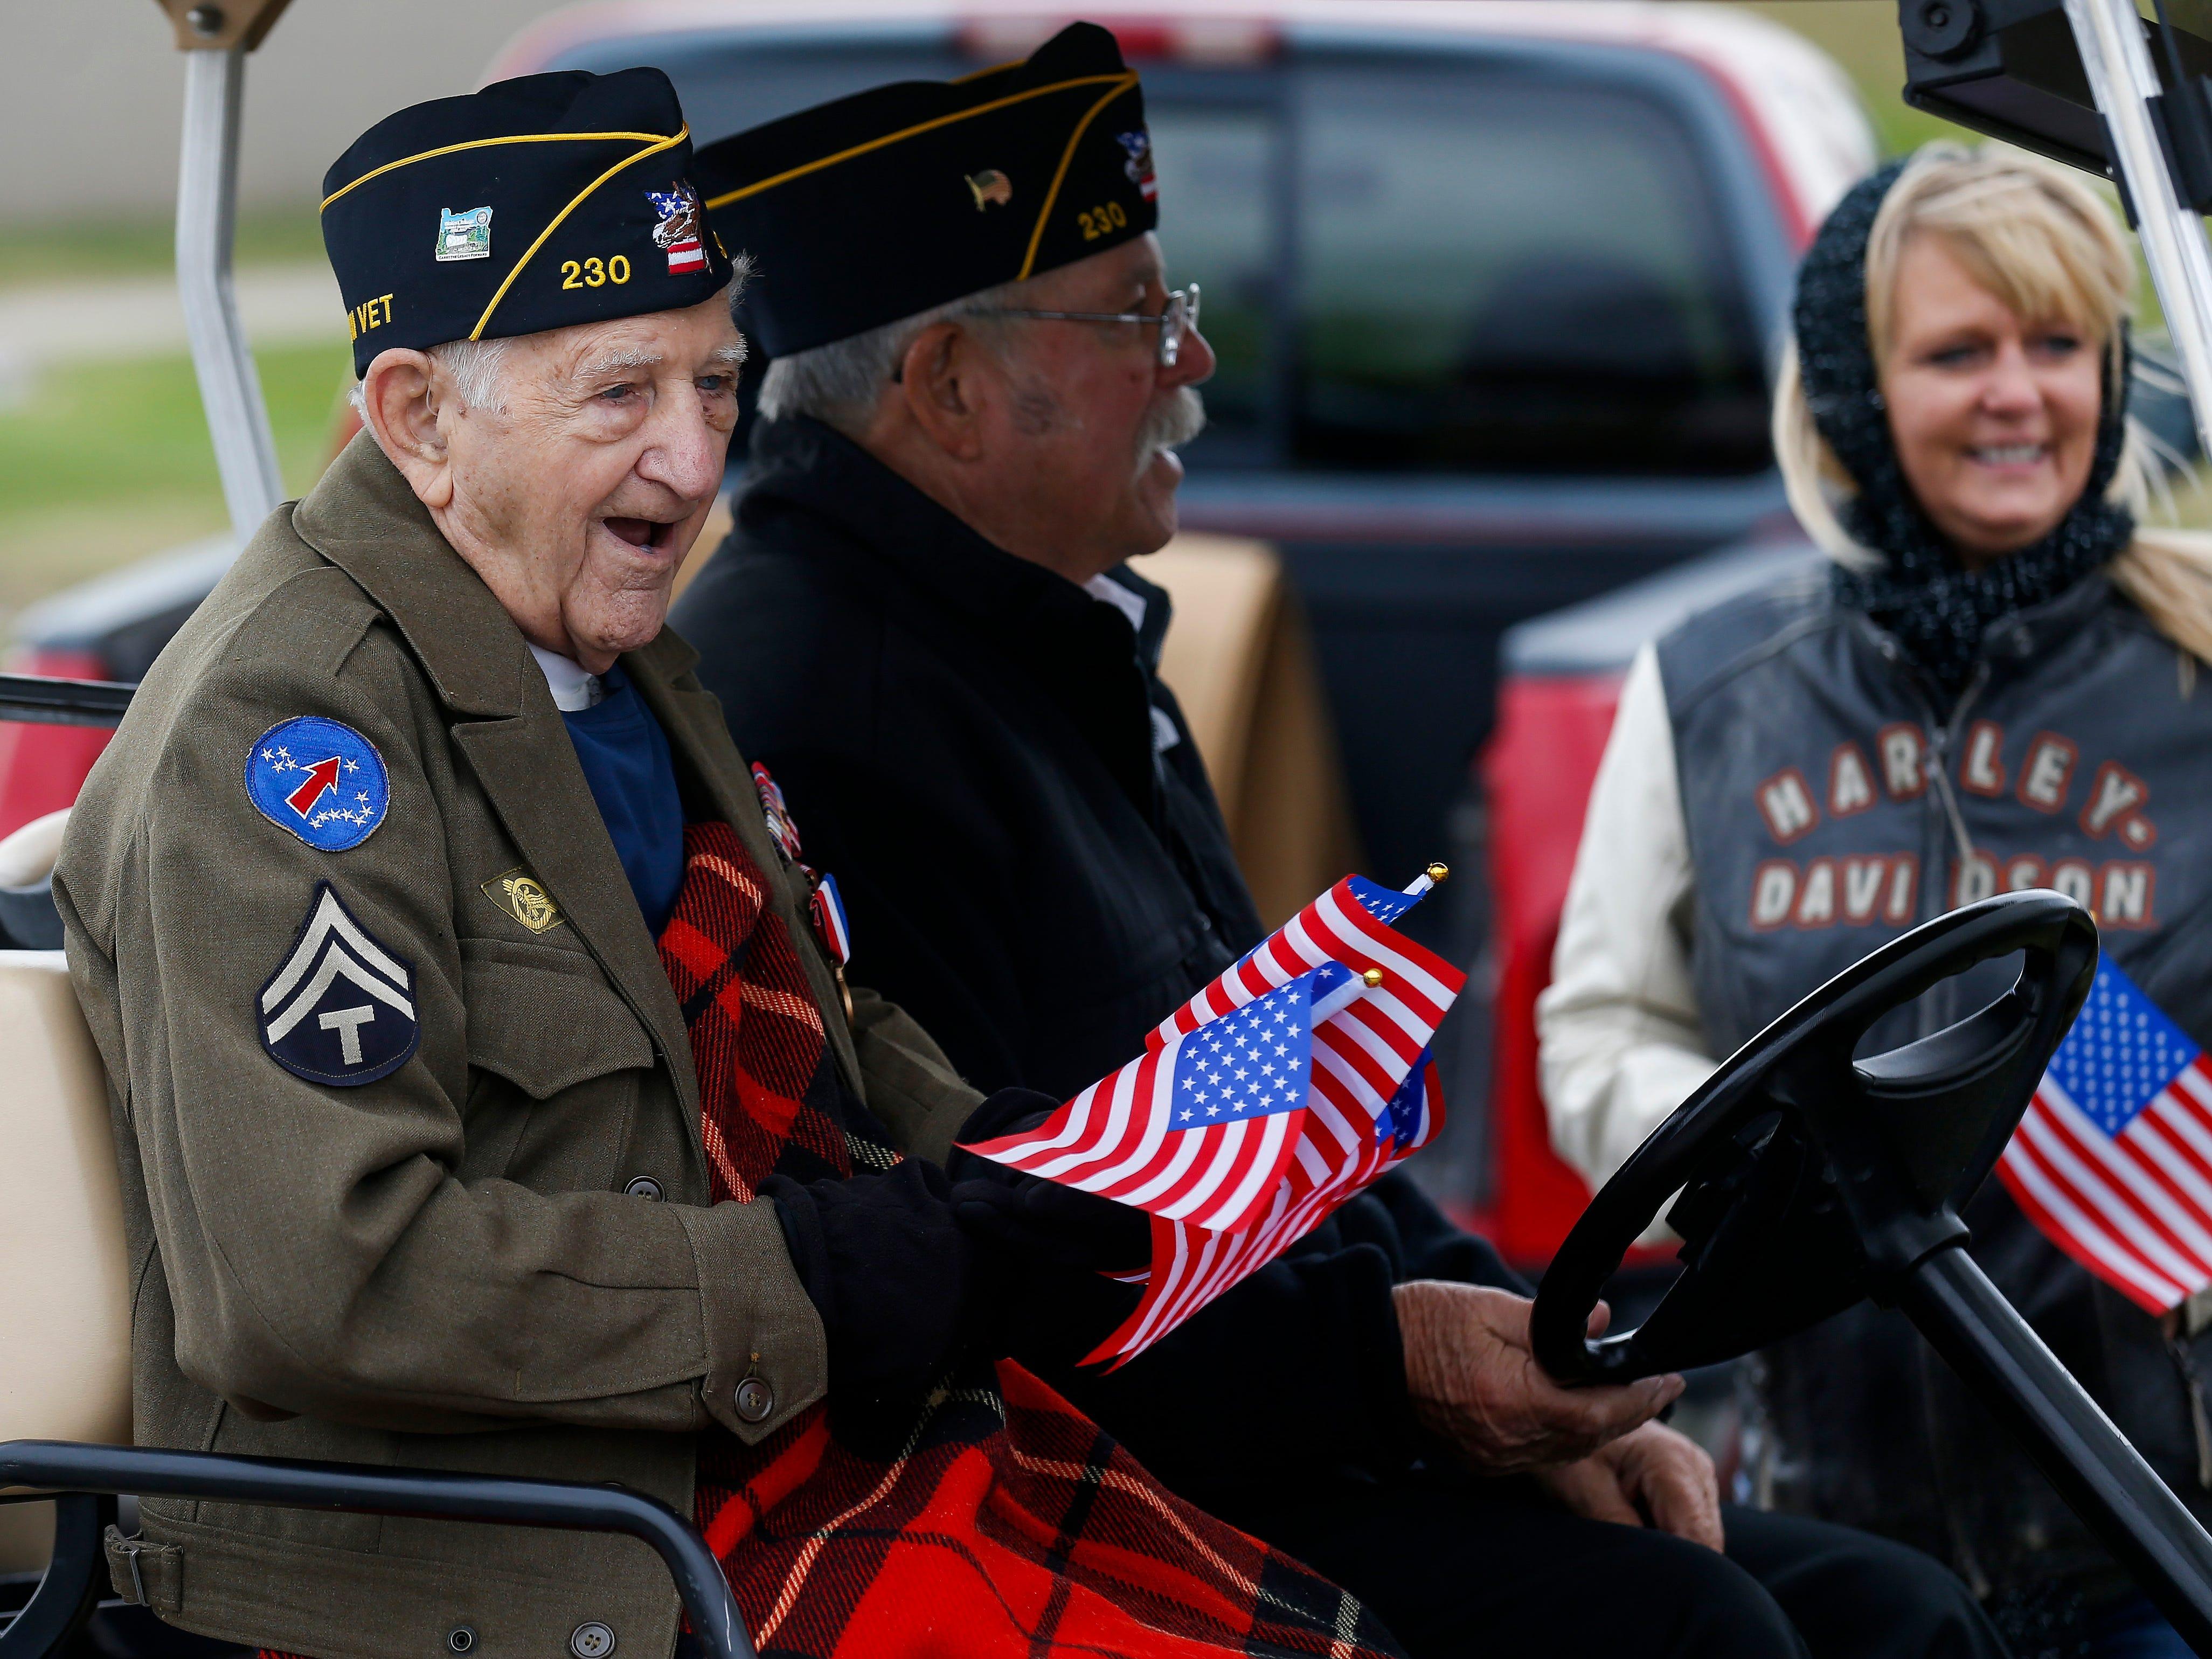 World War II veteran Leonard Branecki hands out flags in Willard for the 2nd Annual Western Greene County Veterans Day Parade on Saturday, Nov. 3, 2018.